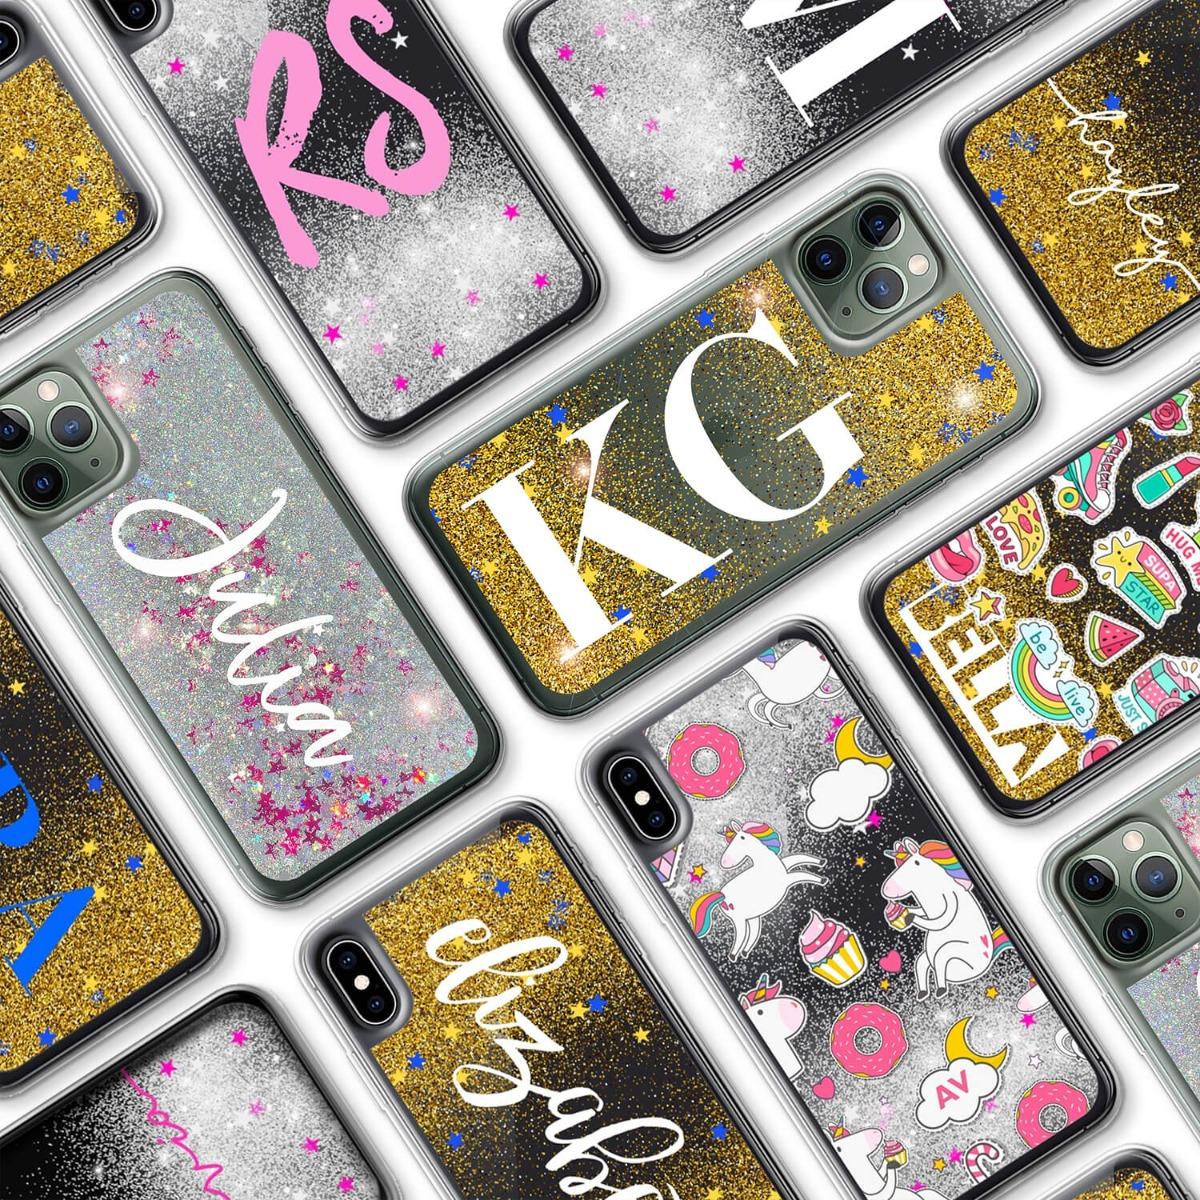 iPhone 11 Pro Glitter Case 16125